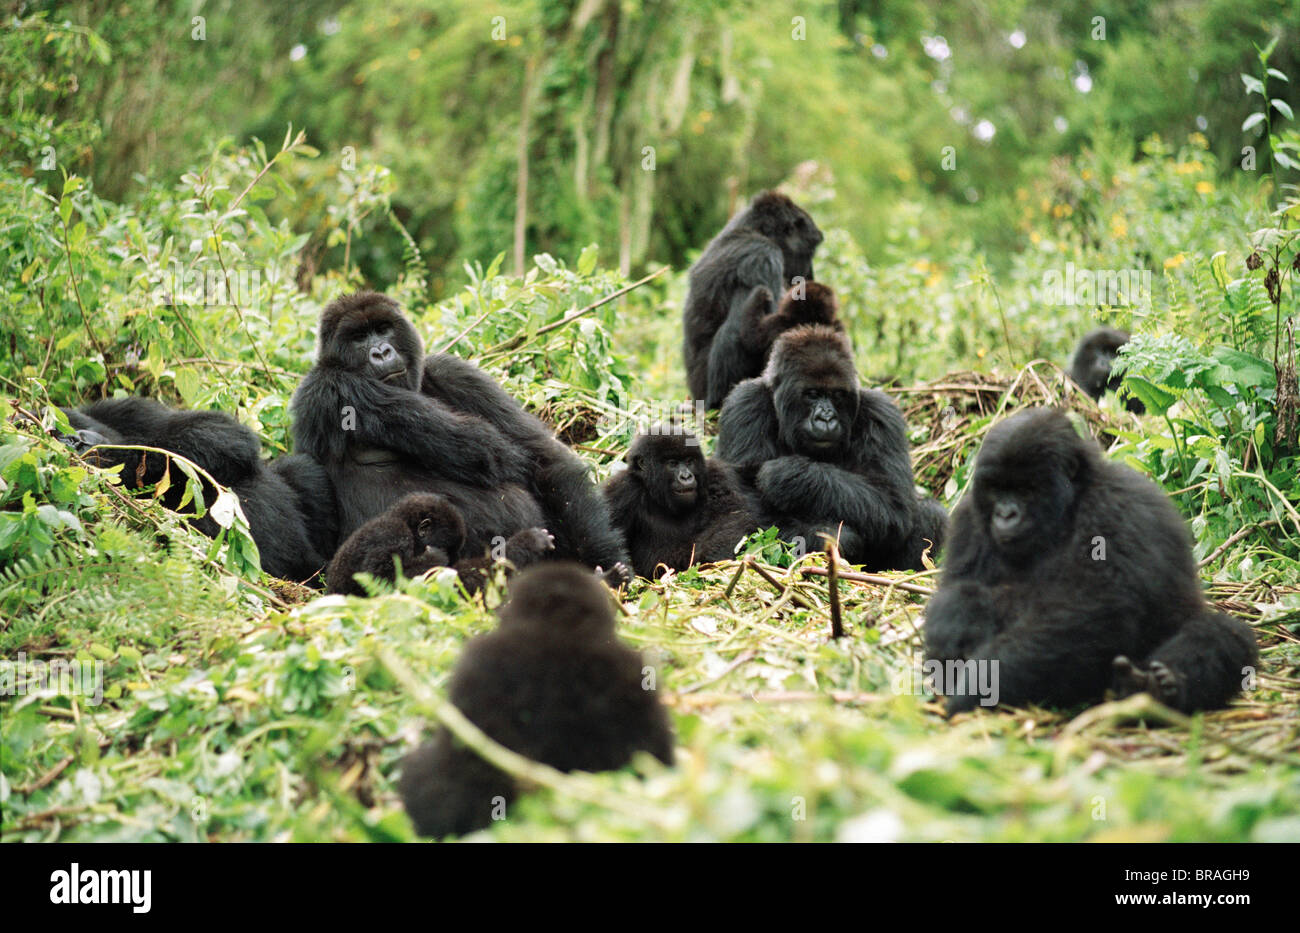 Mountain Gorillas (Gorilla gorilla beringei), silverback male resting with group, Virunga Volcanoes, Rwanda, Africa - Stock Image